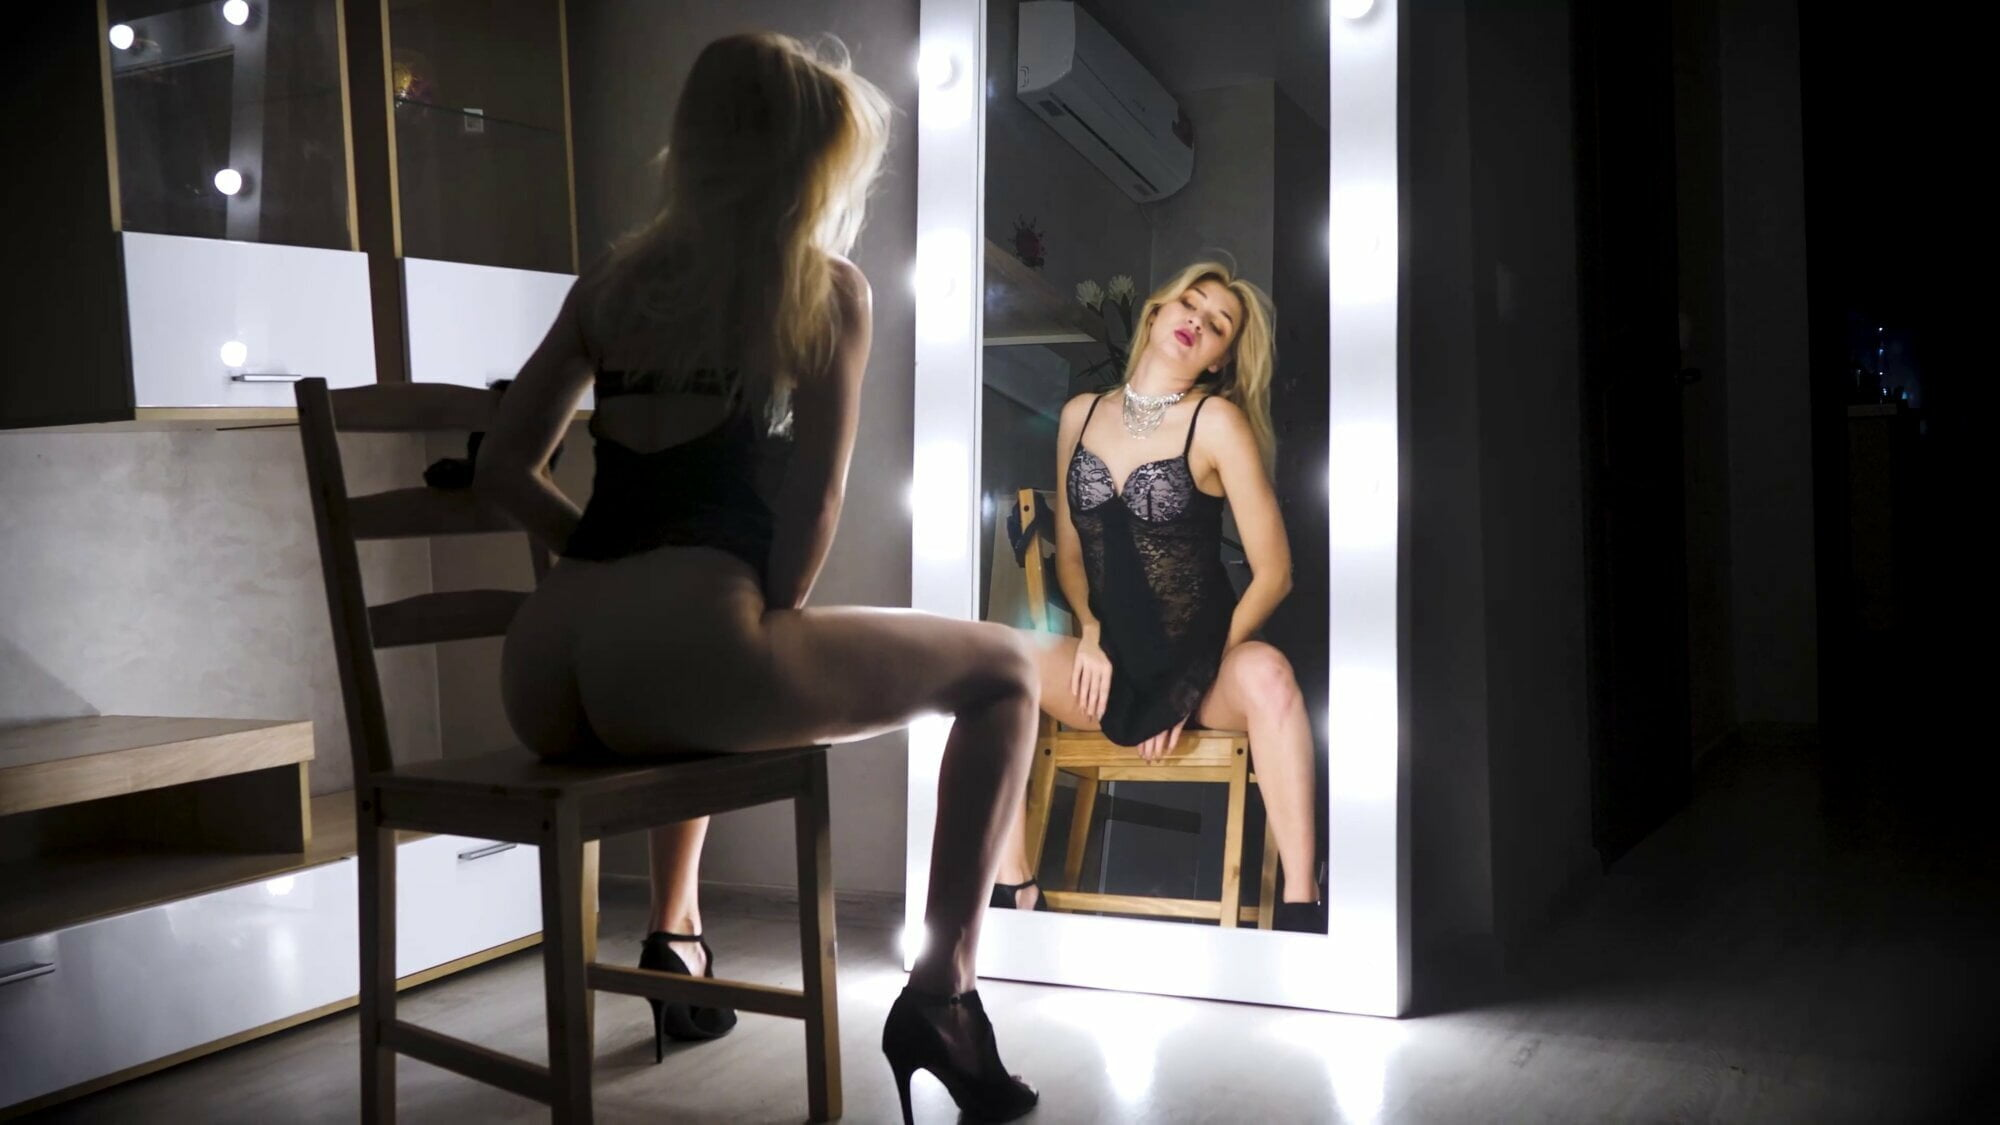 GIRL SEXUALLY MASTURBATES AGAINST THE MIRROR